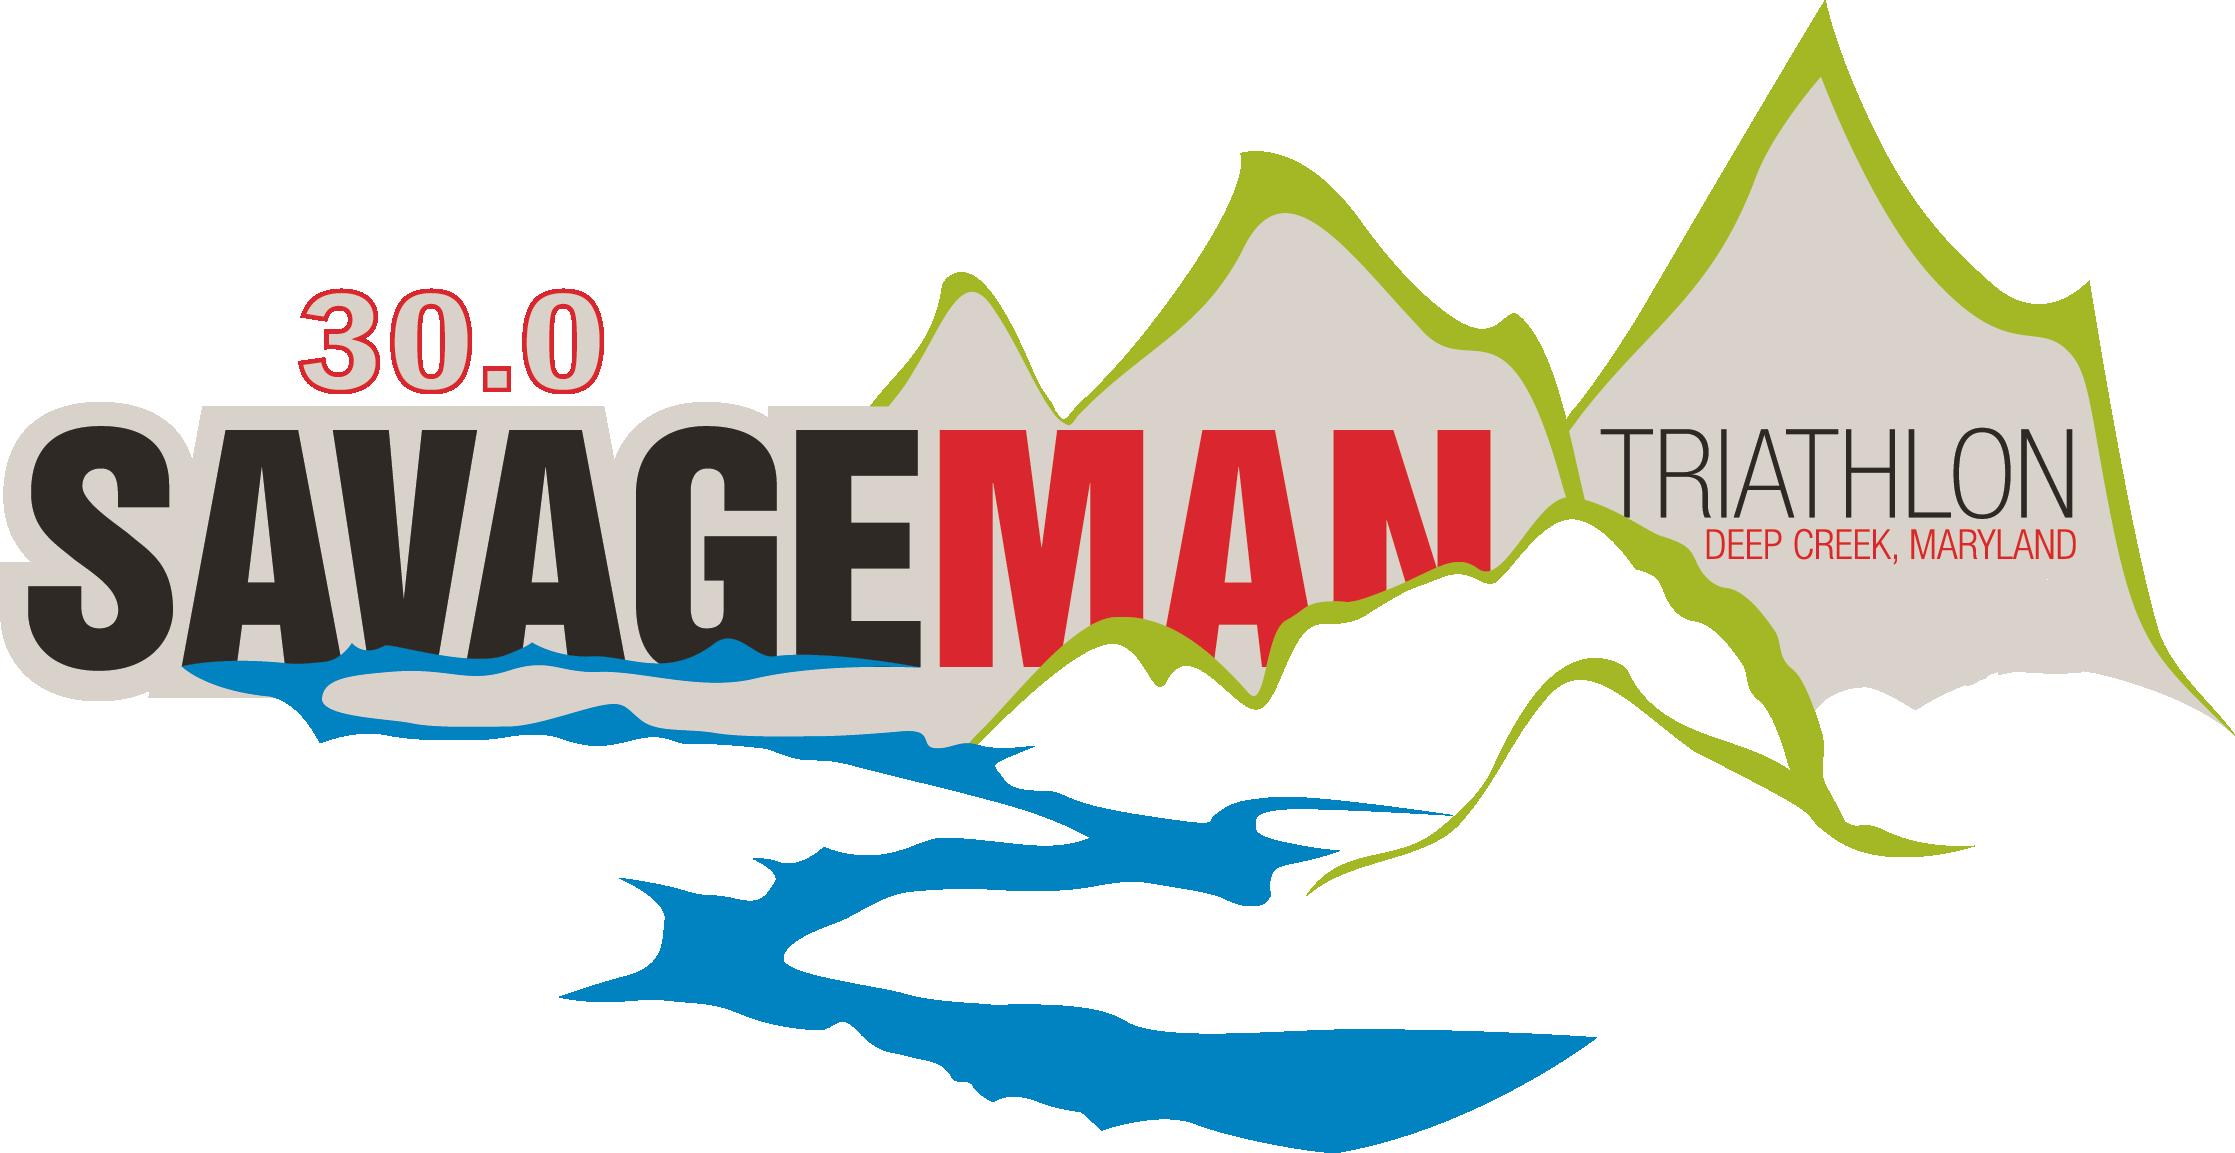 Savagman-Triathlon-No-Date30